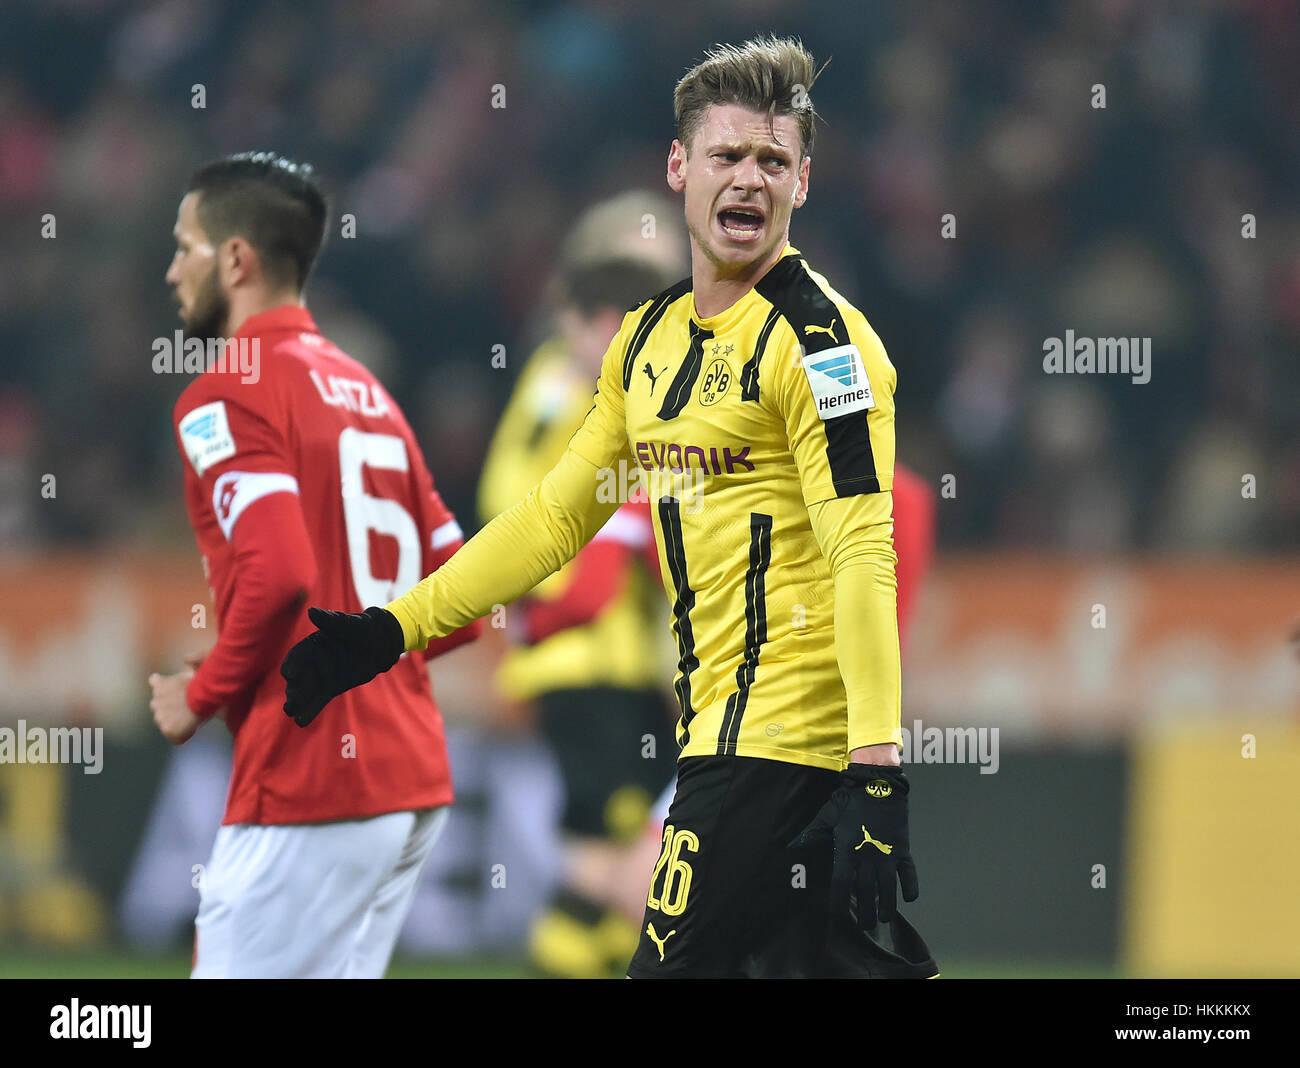 Dortmund s Lukasz Piszczek reacts during the Bundesliga soccer